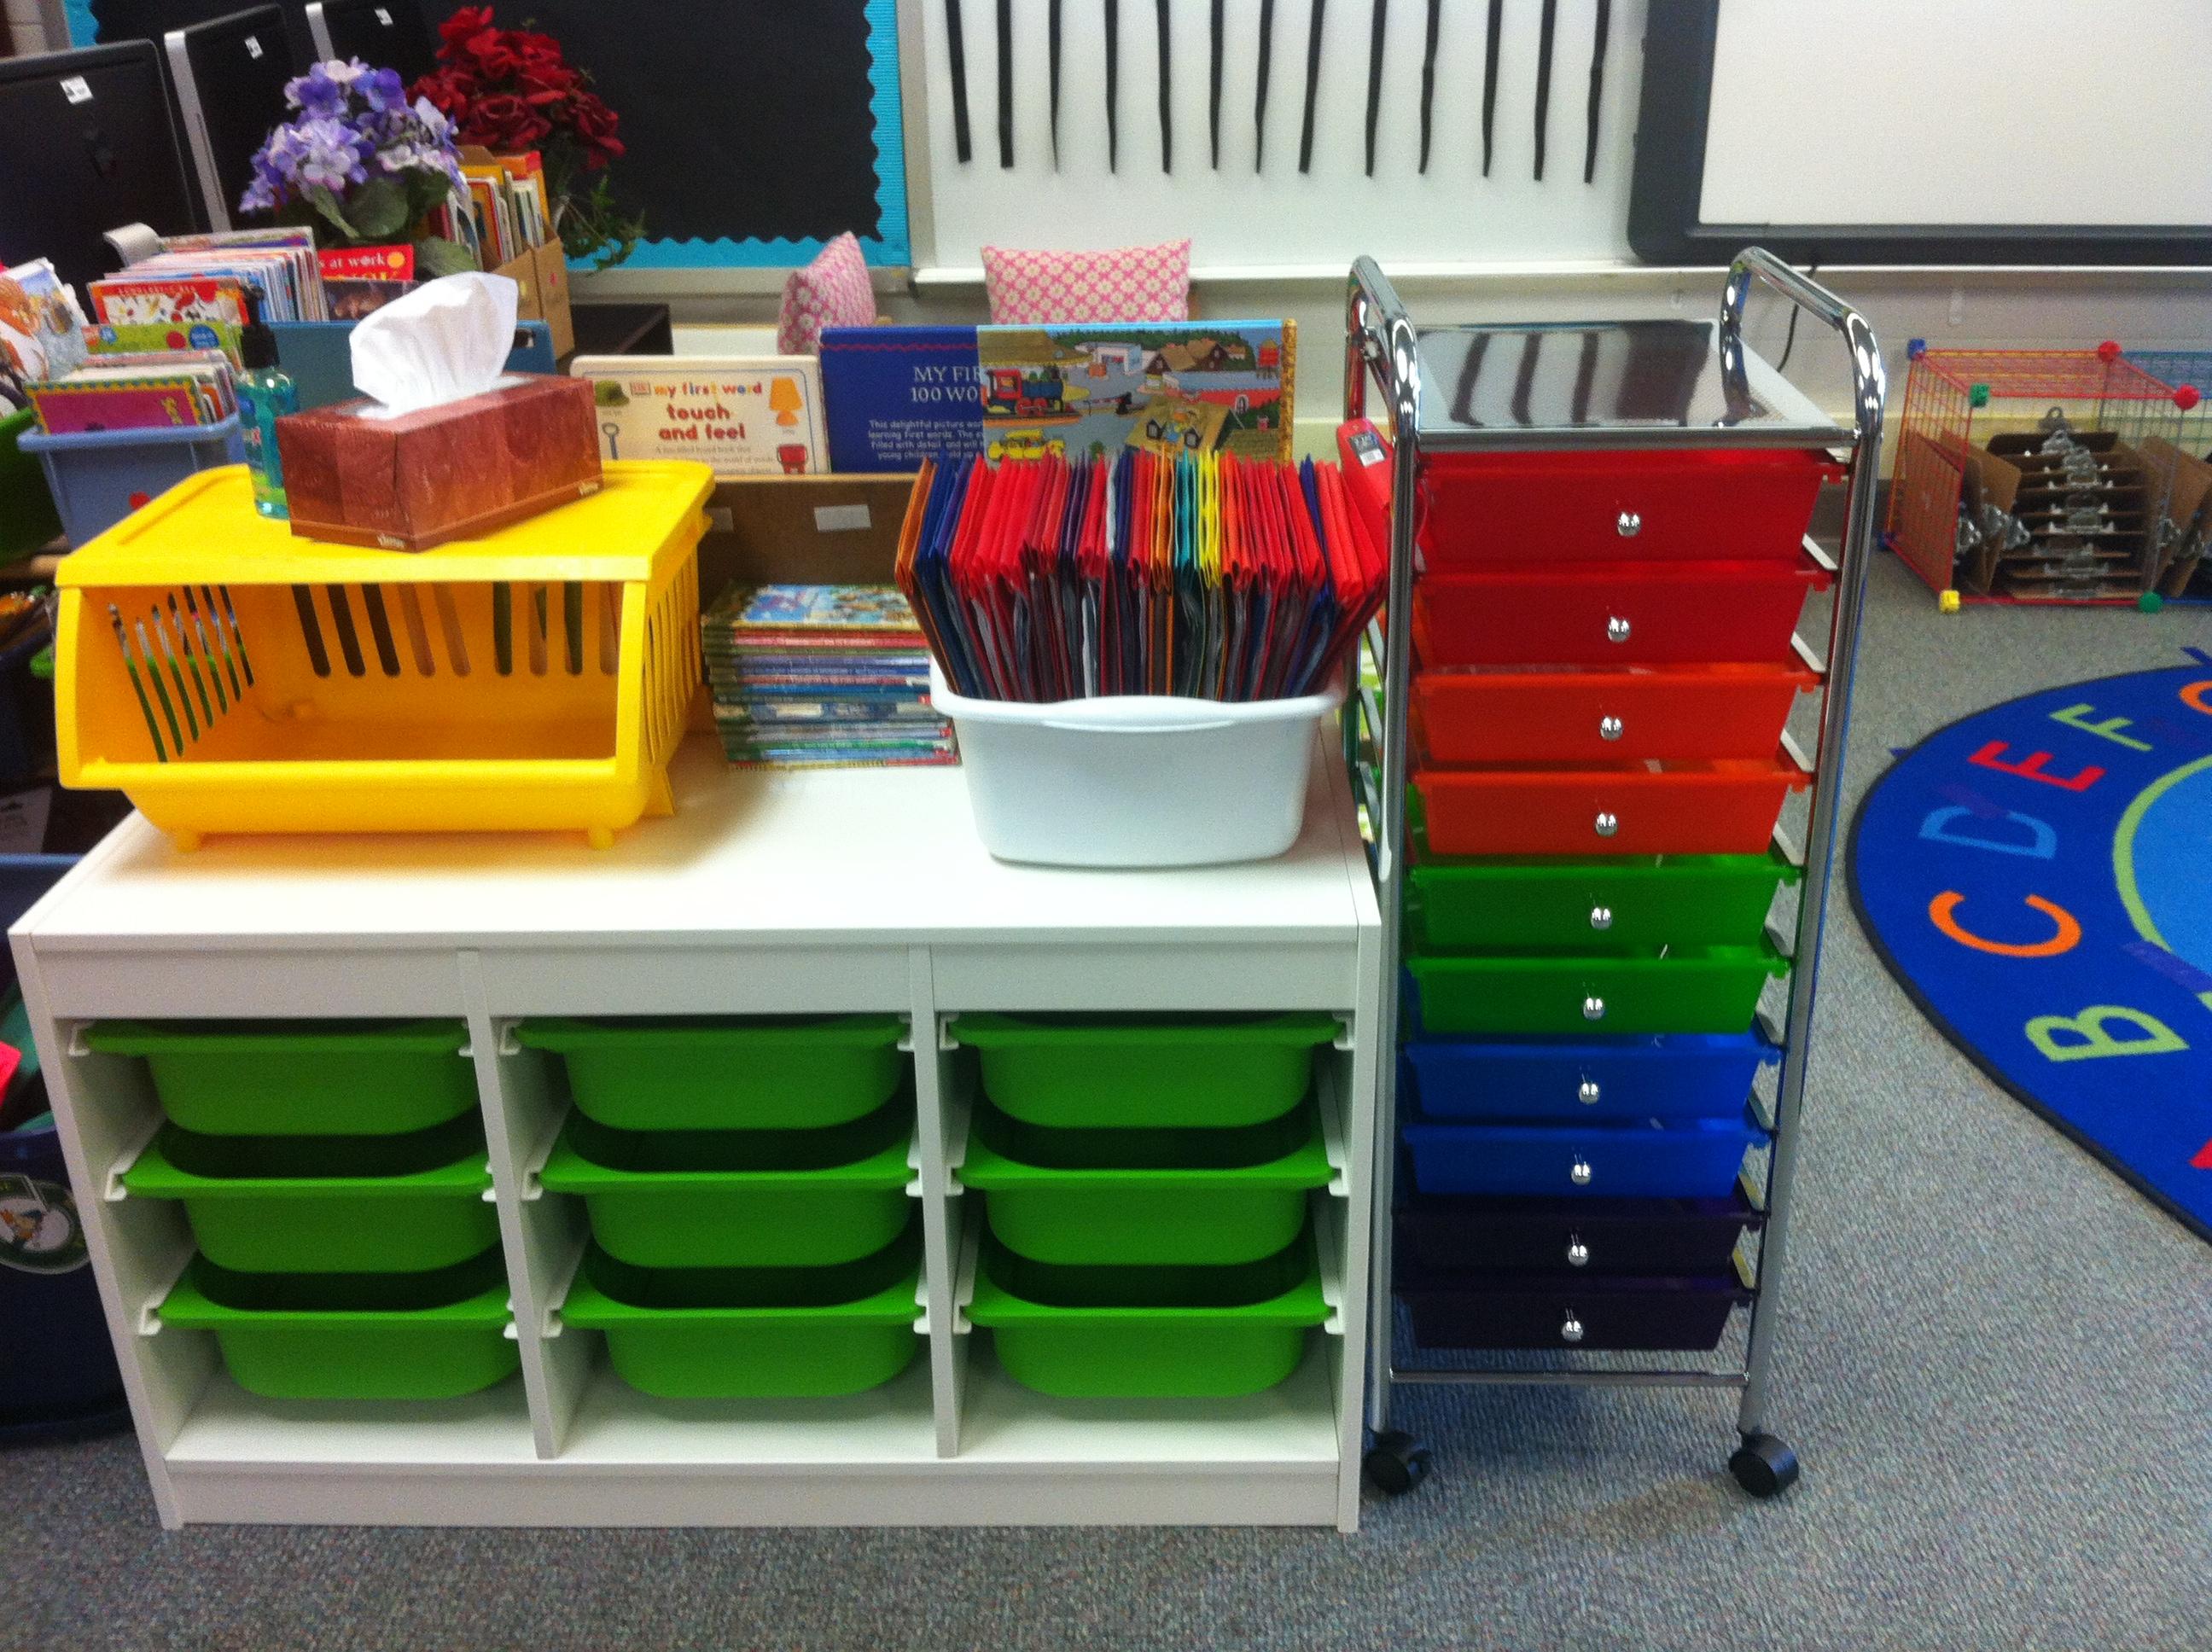 Kinder Garden: More Classroom Pictures 2013-2014